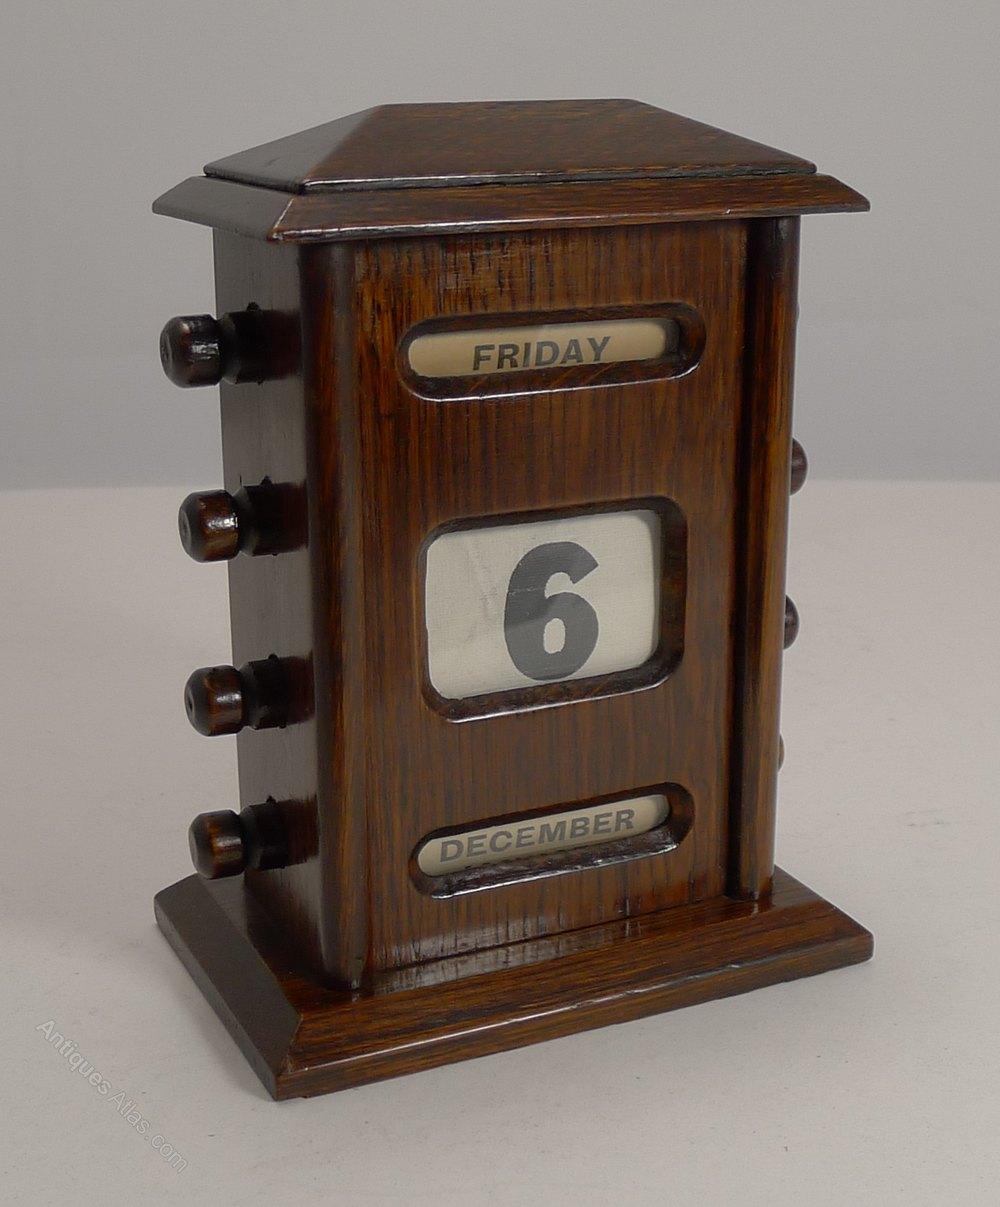 Perpetual Calendar Desk : Antiques atlas antique english oak perpetual desk calendar